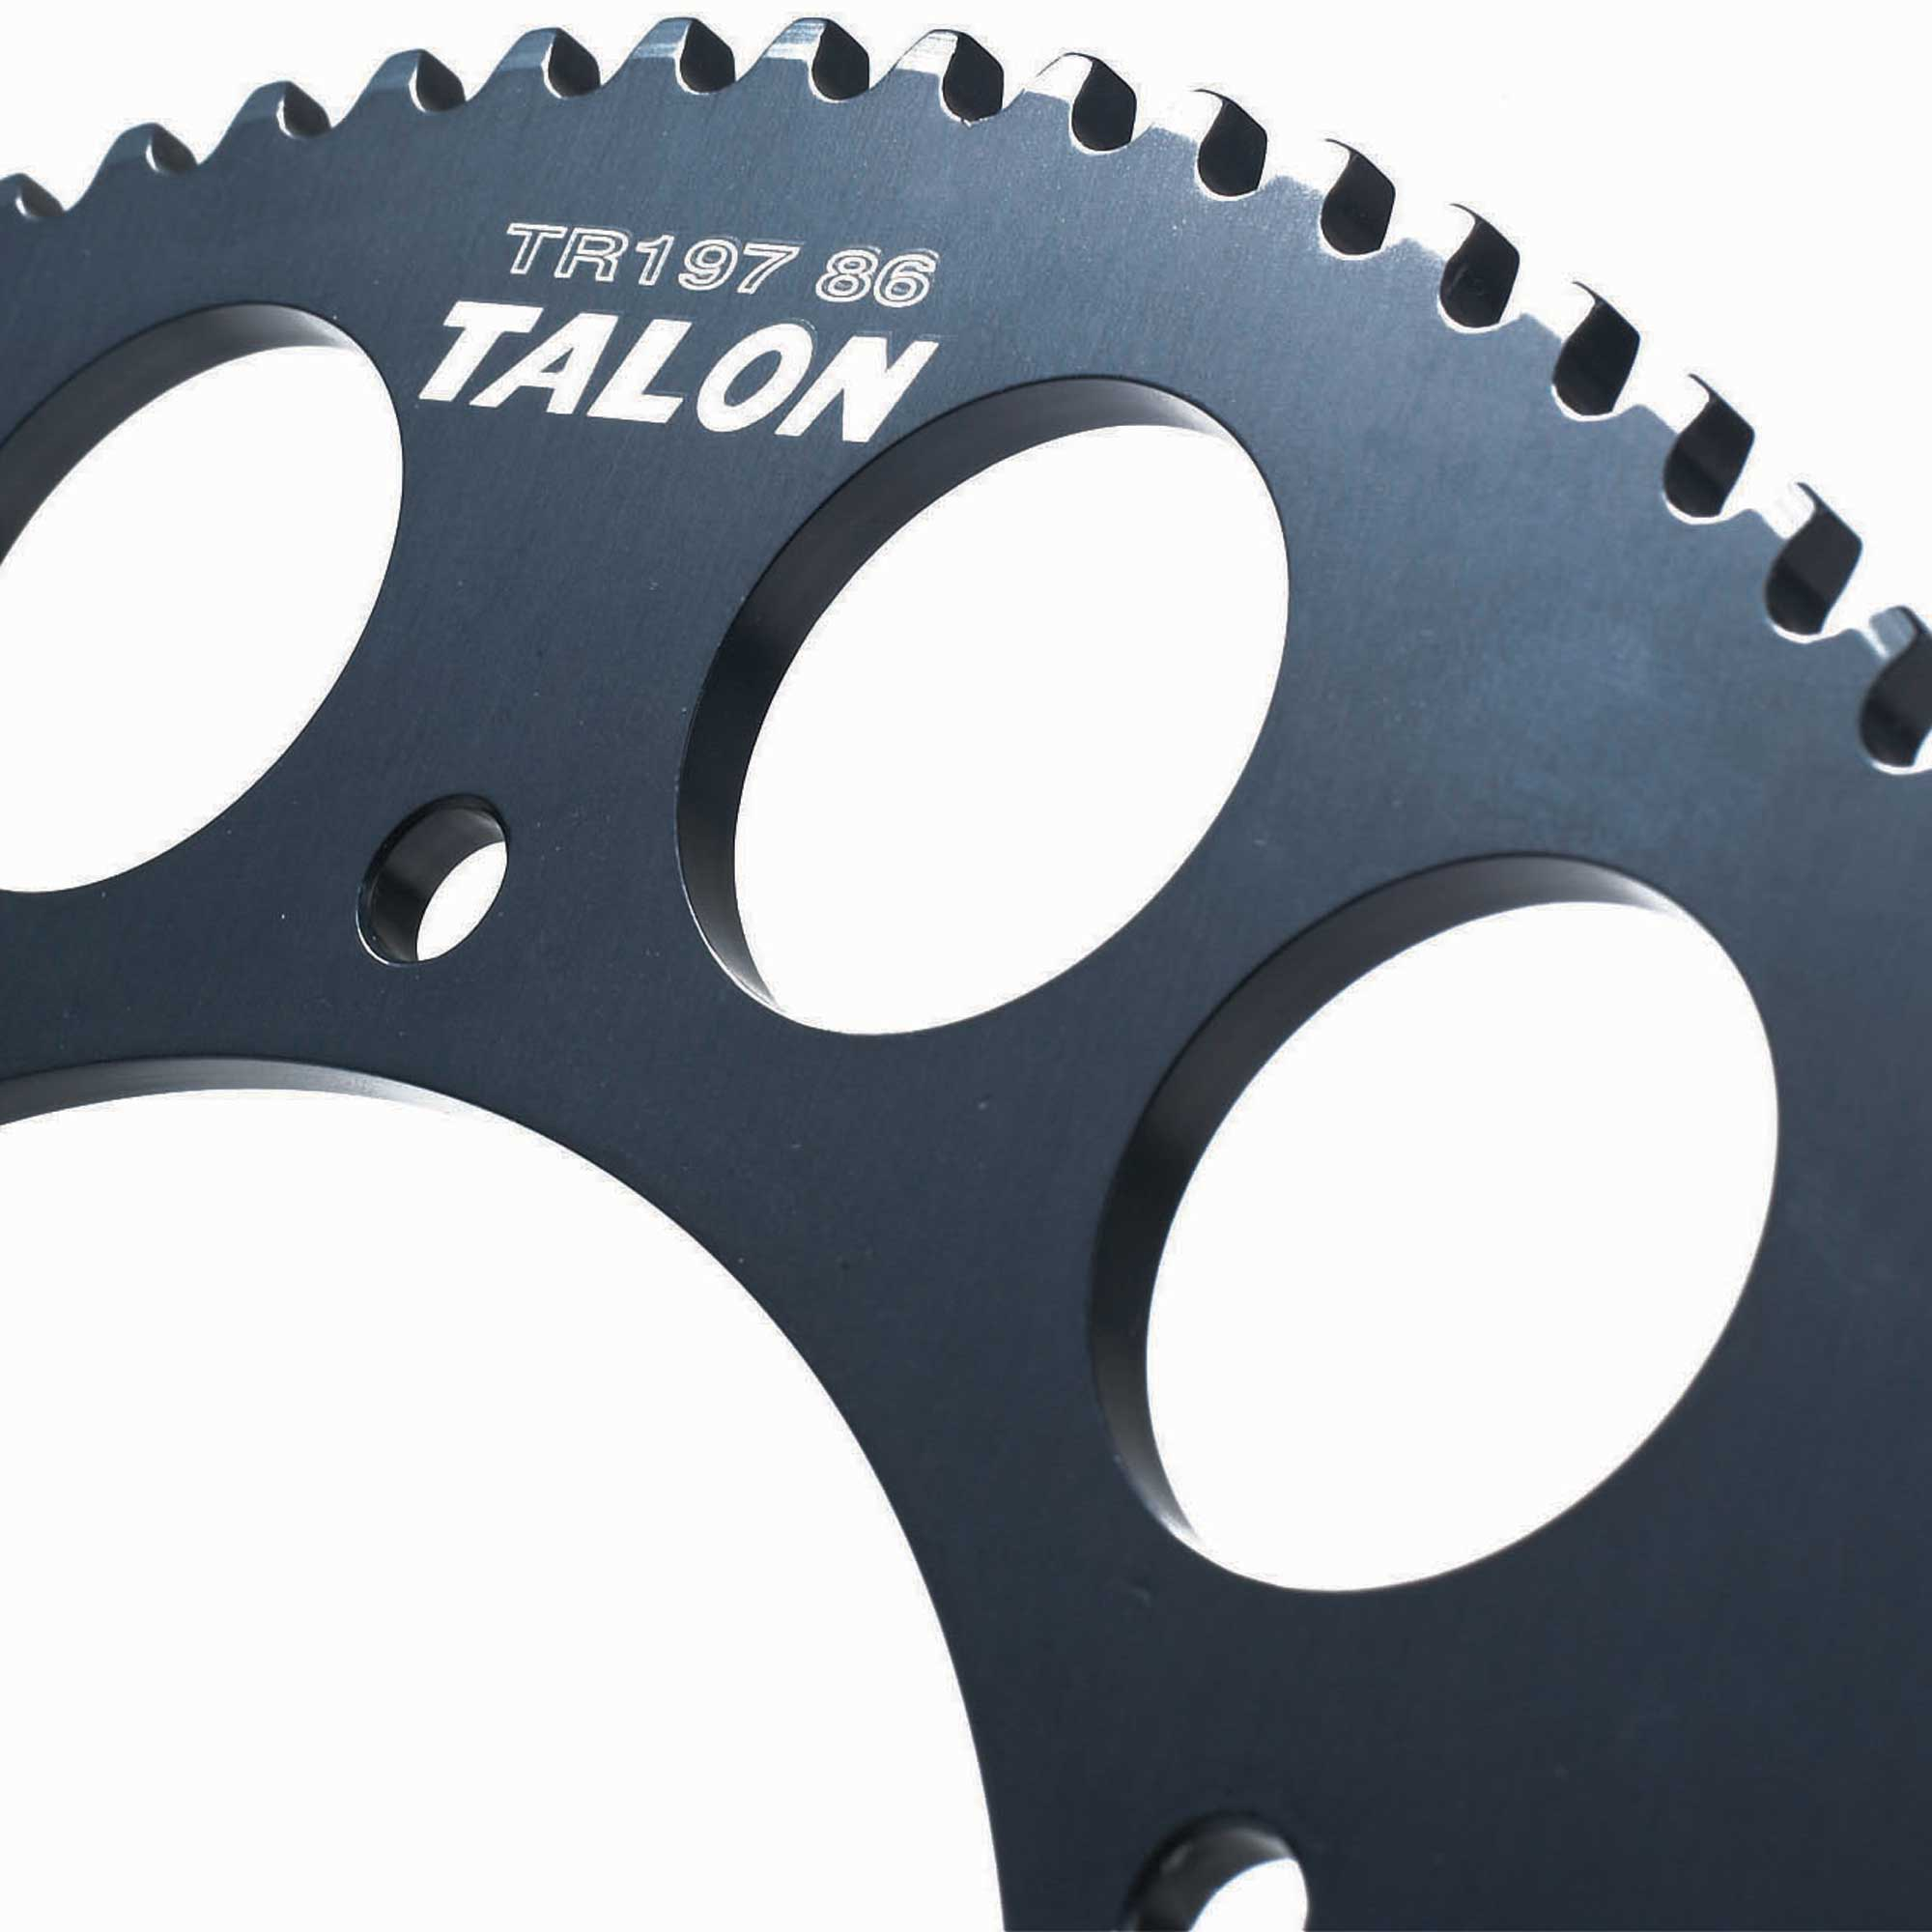 Talon 219 Lightweight Anodised Kart//Karting Titanium Colour Sprockets 68 Teeth